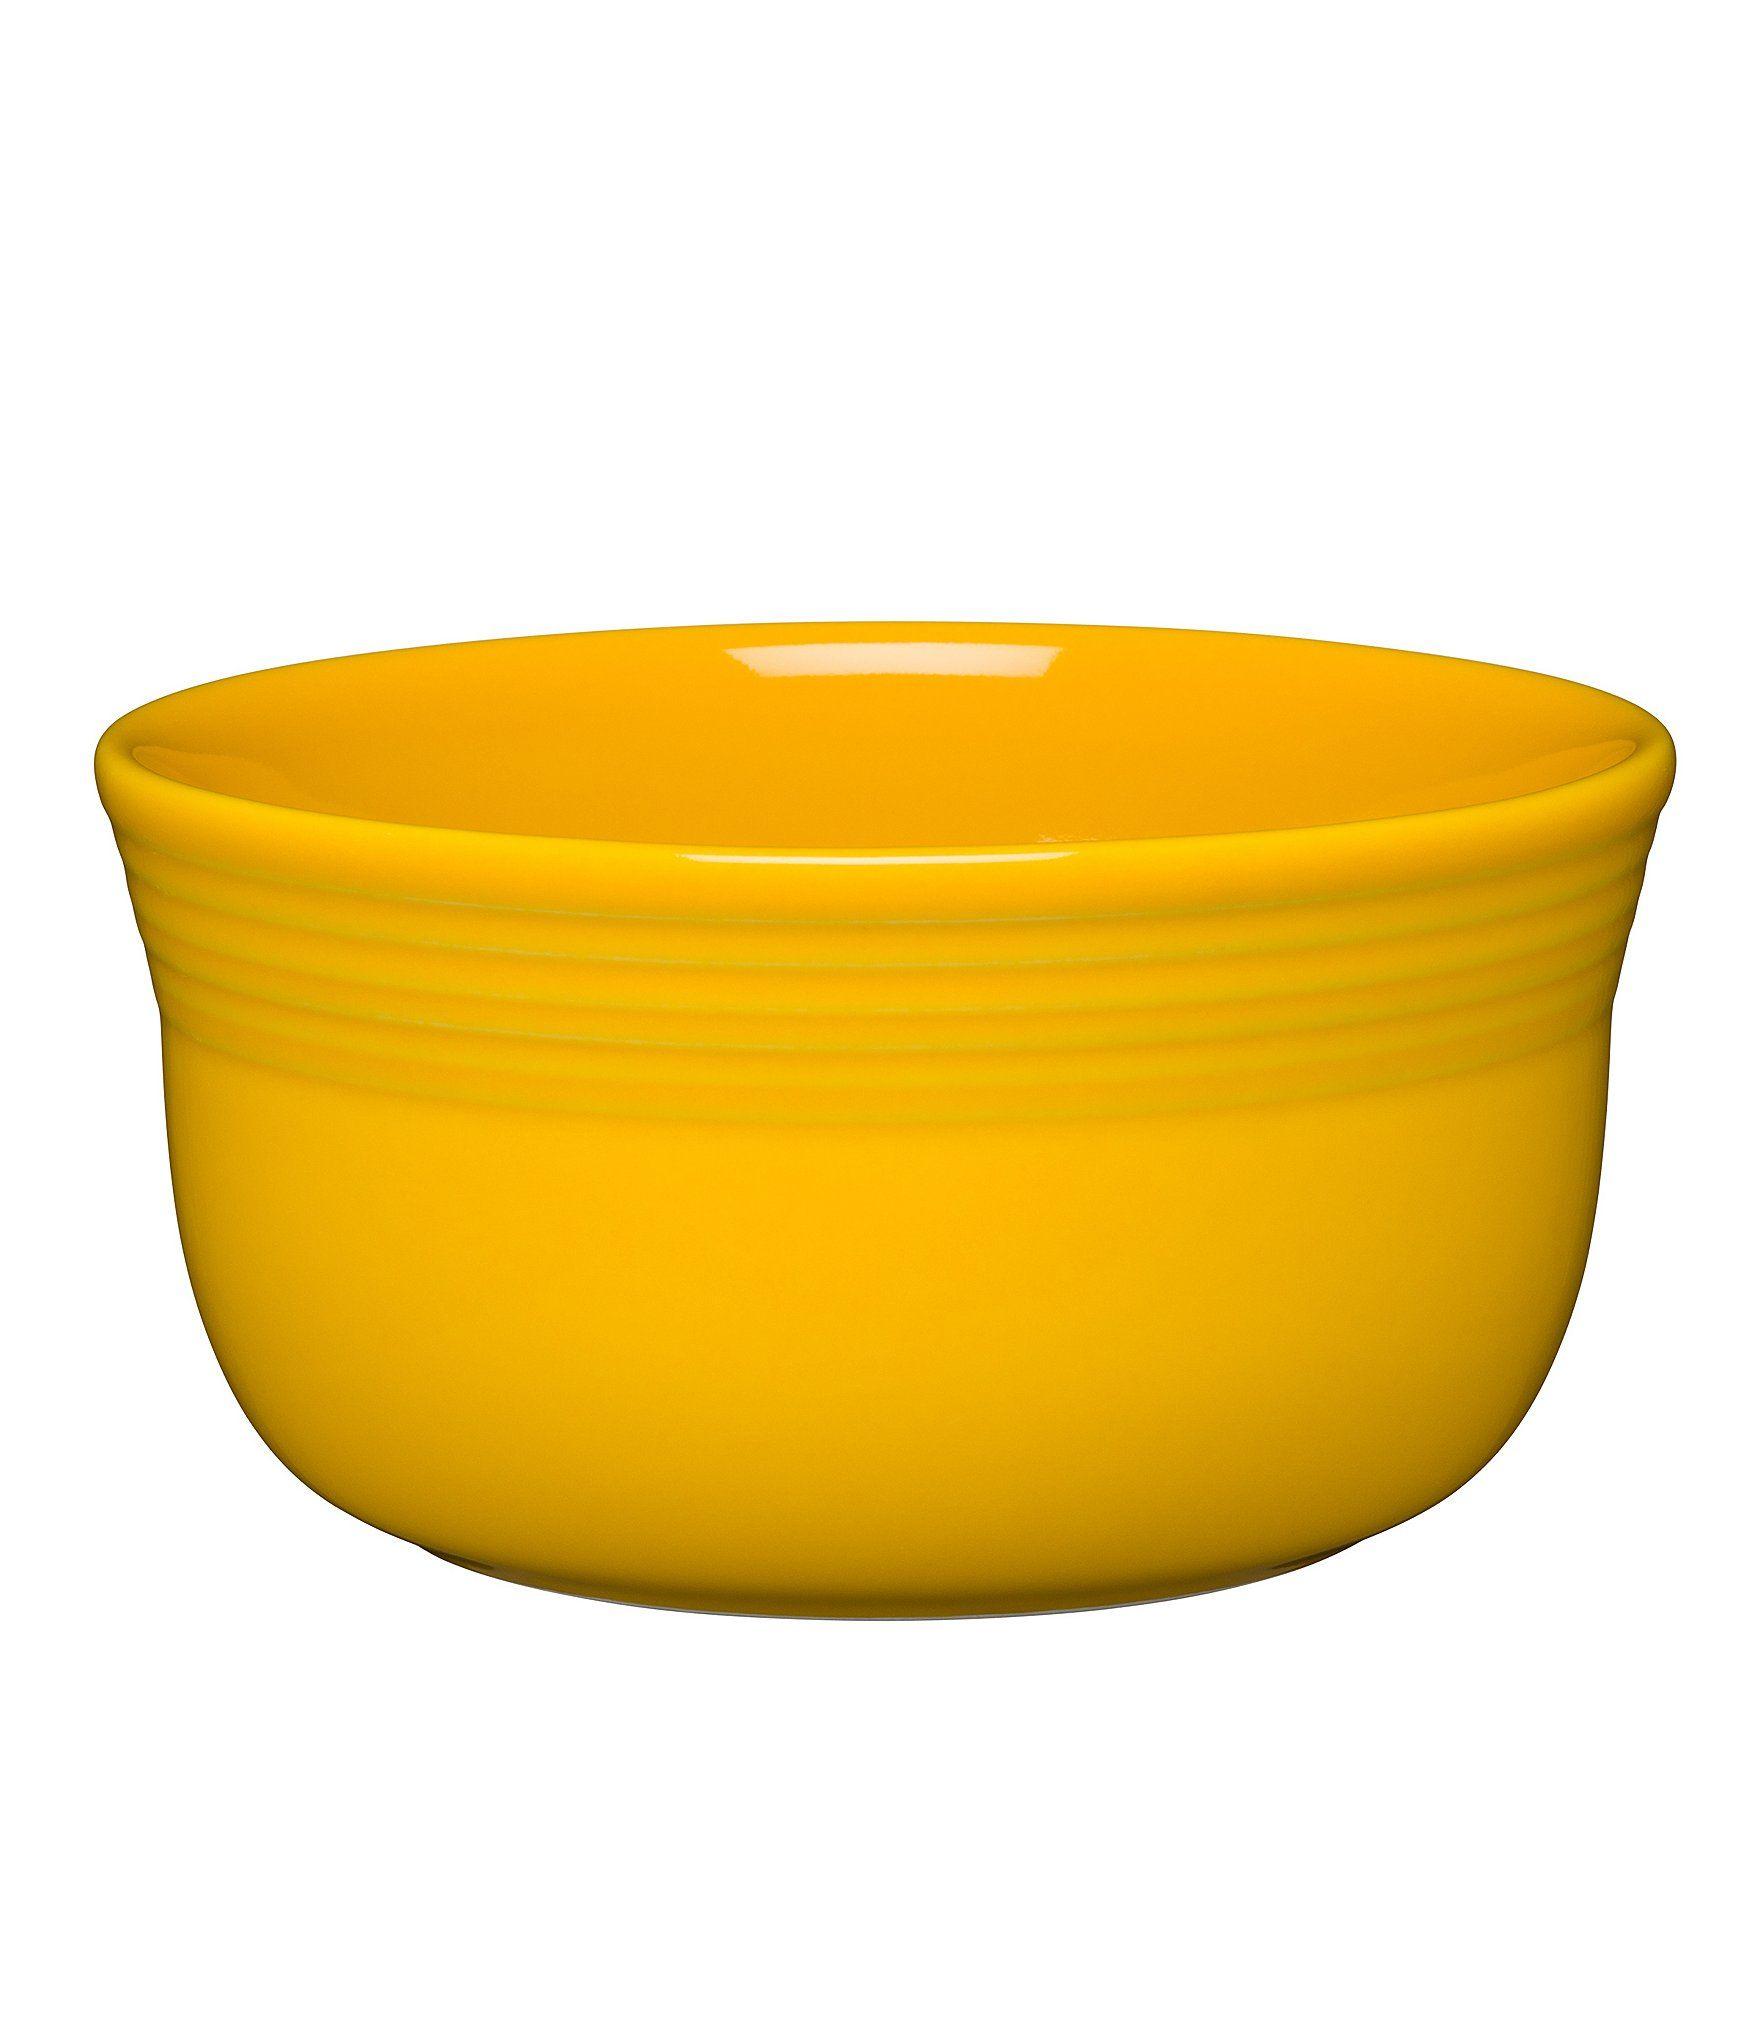 Fiesta Gusto Bowl - Daffodil